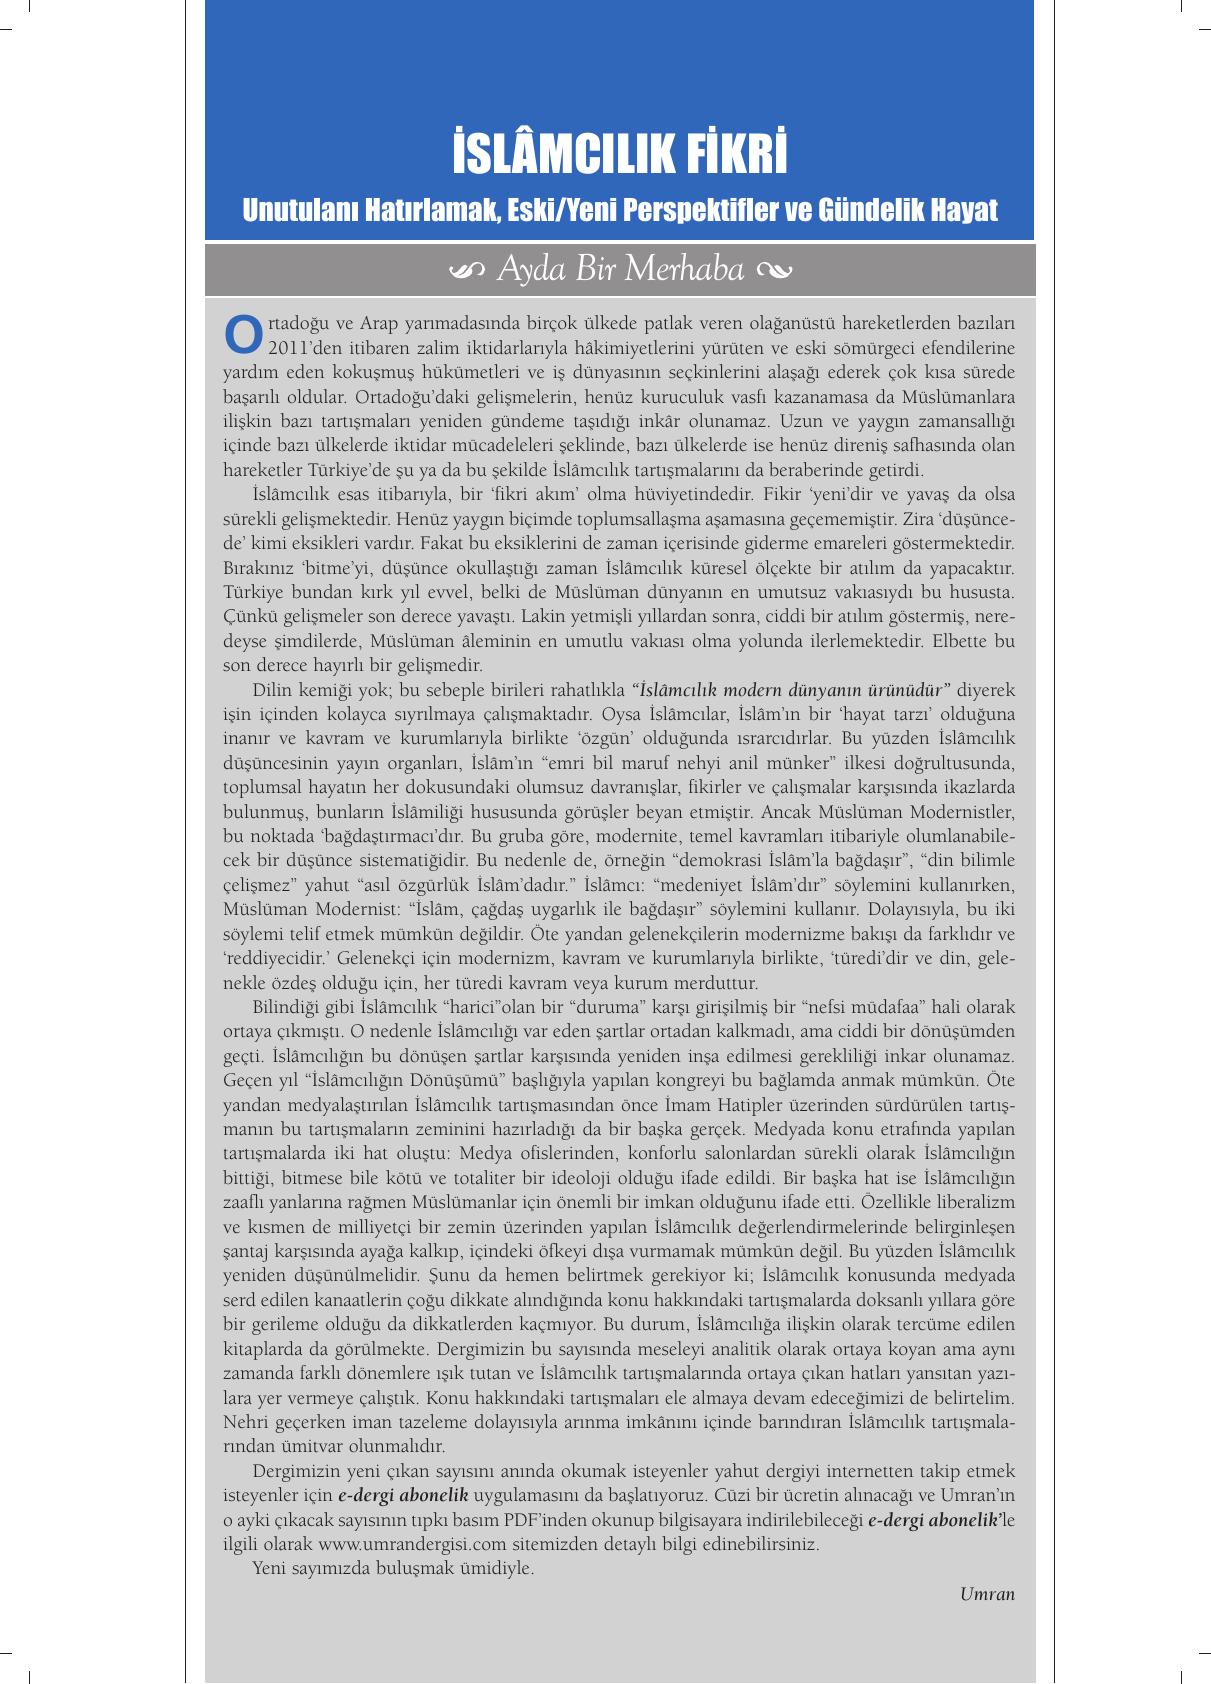 8c9cdd8fa0786 Pdf formatında - Umran Dergisi